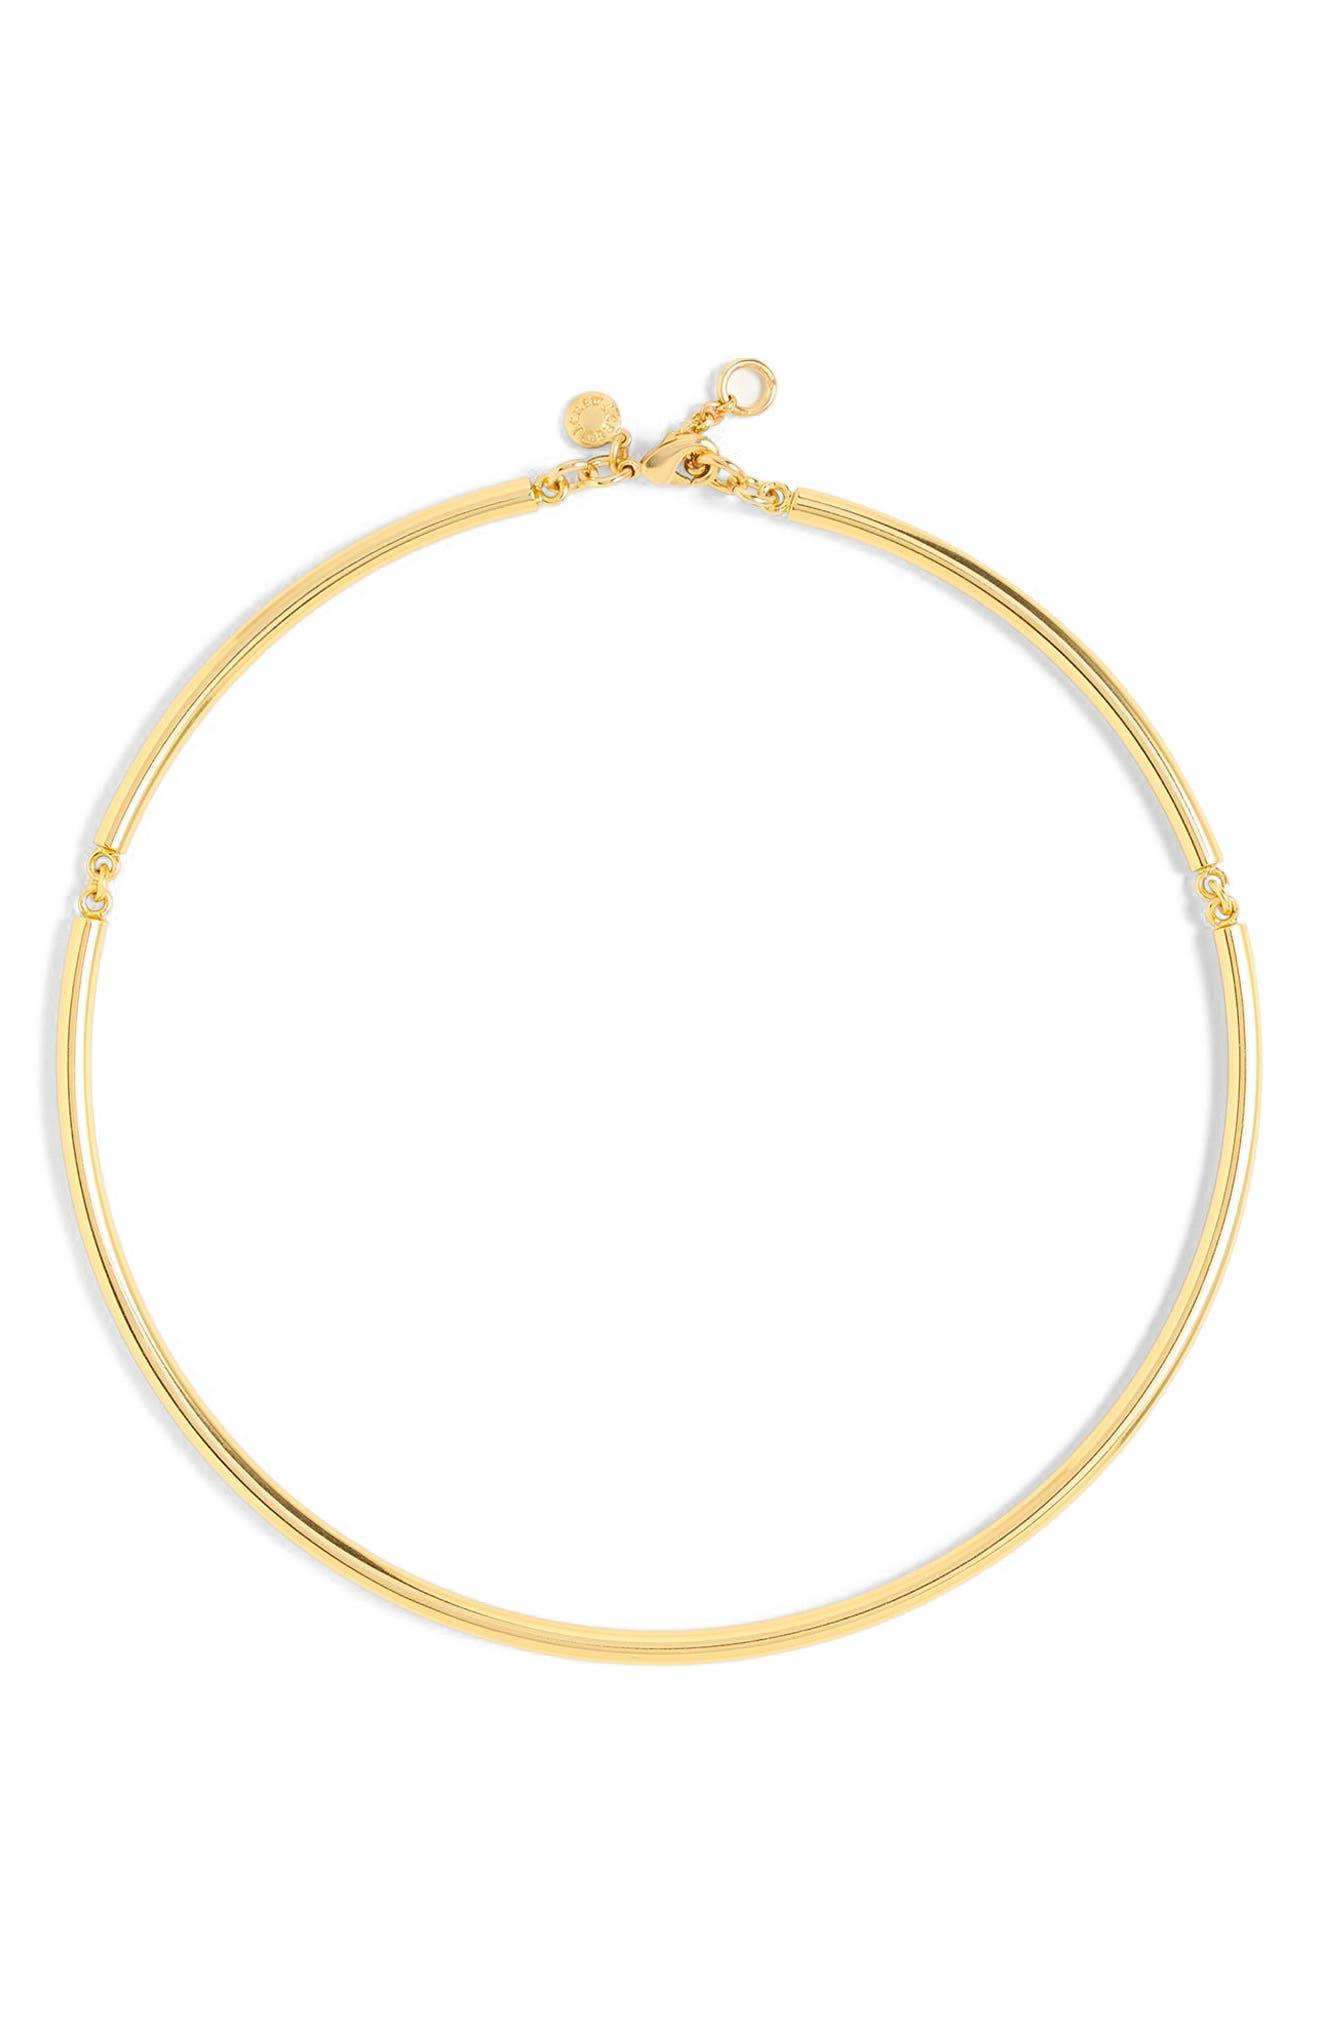 J.Crew Simple Collar Necklace